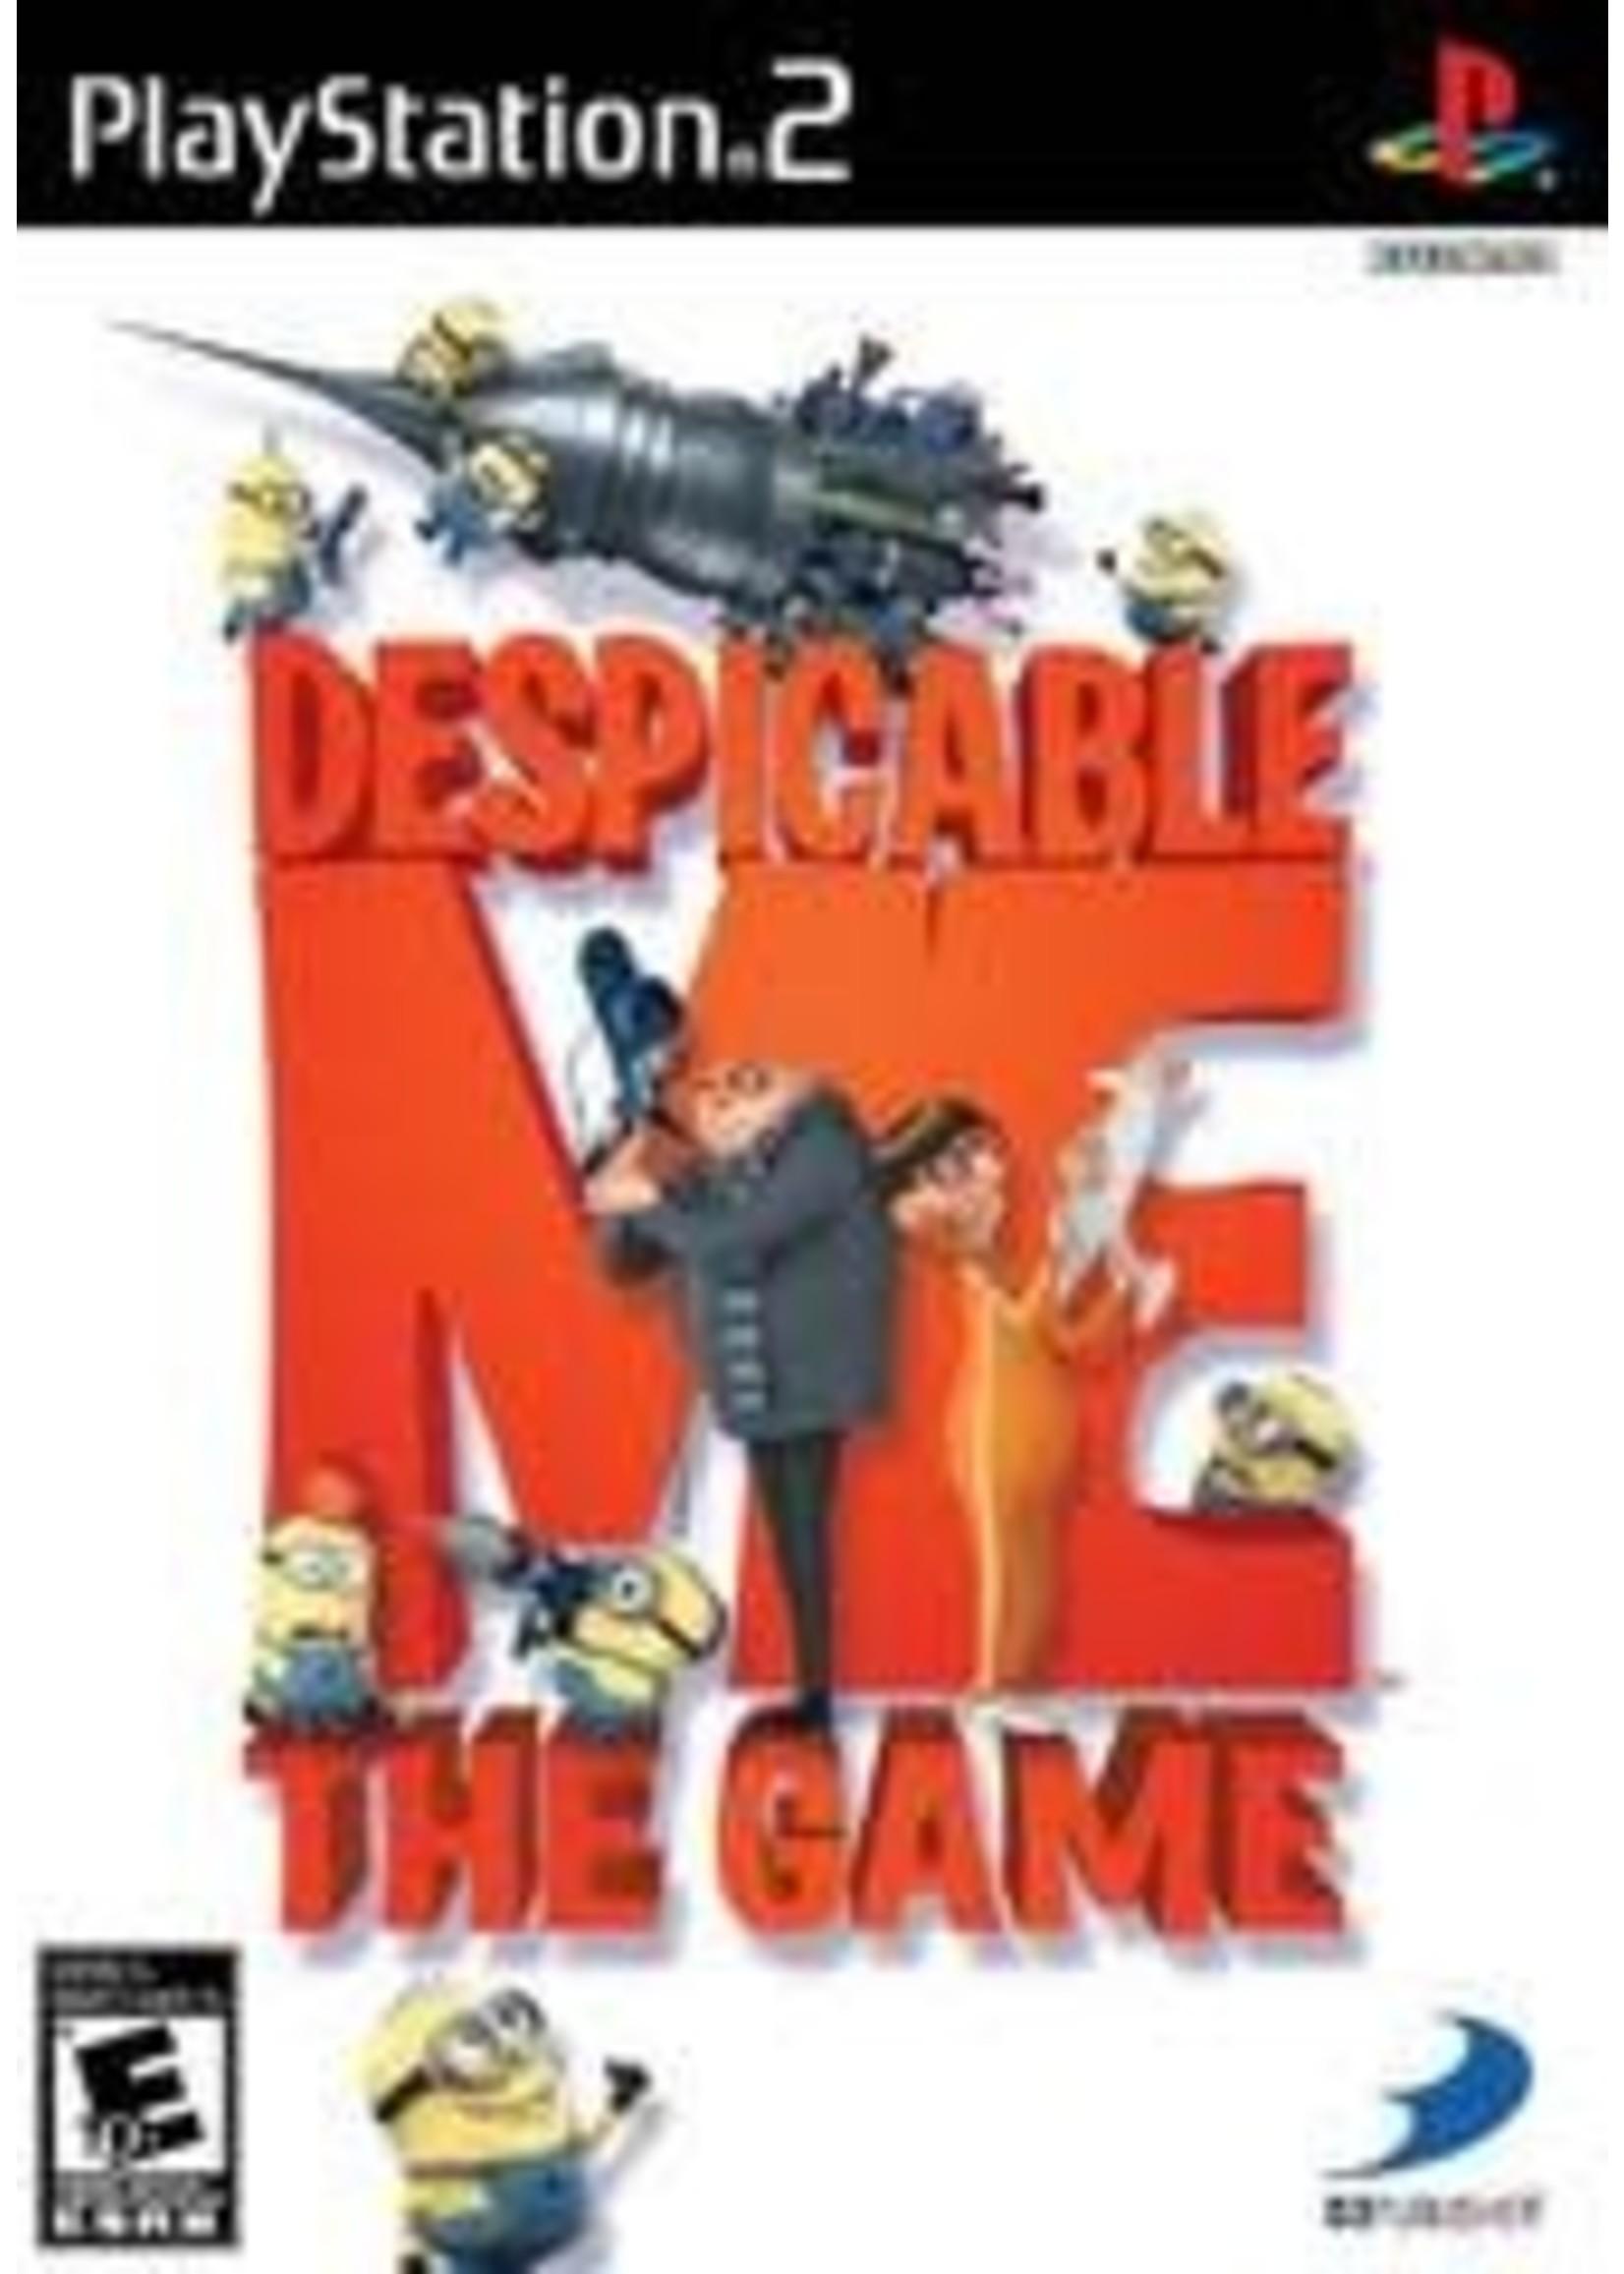 Despicable Me Playstation 2